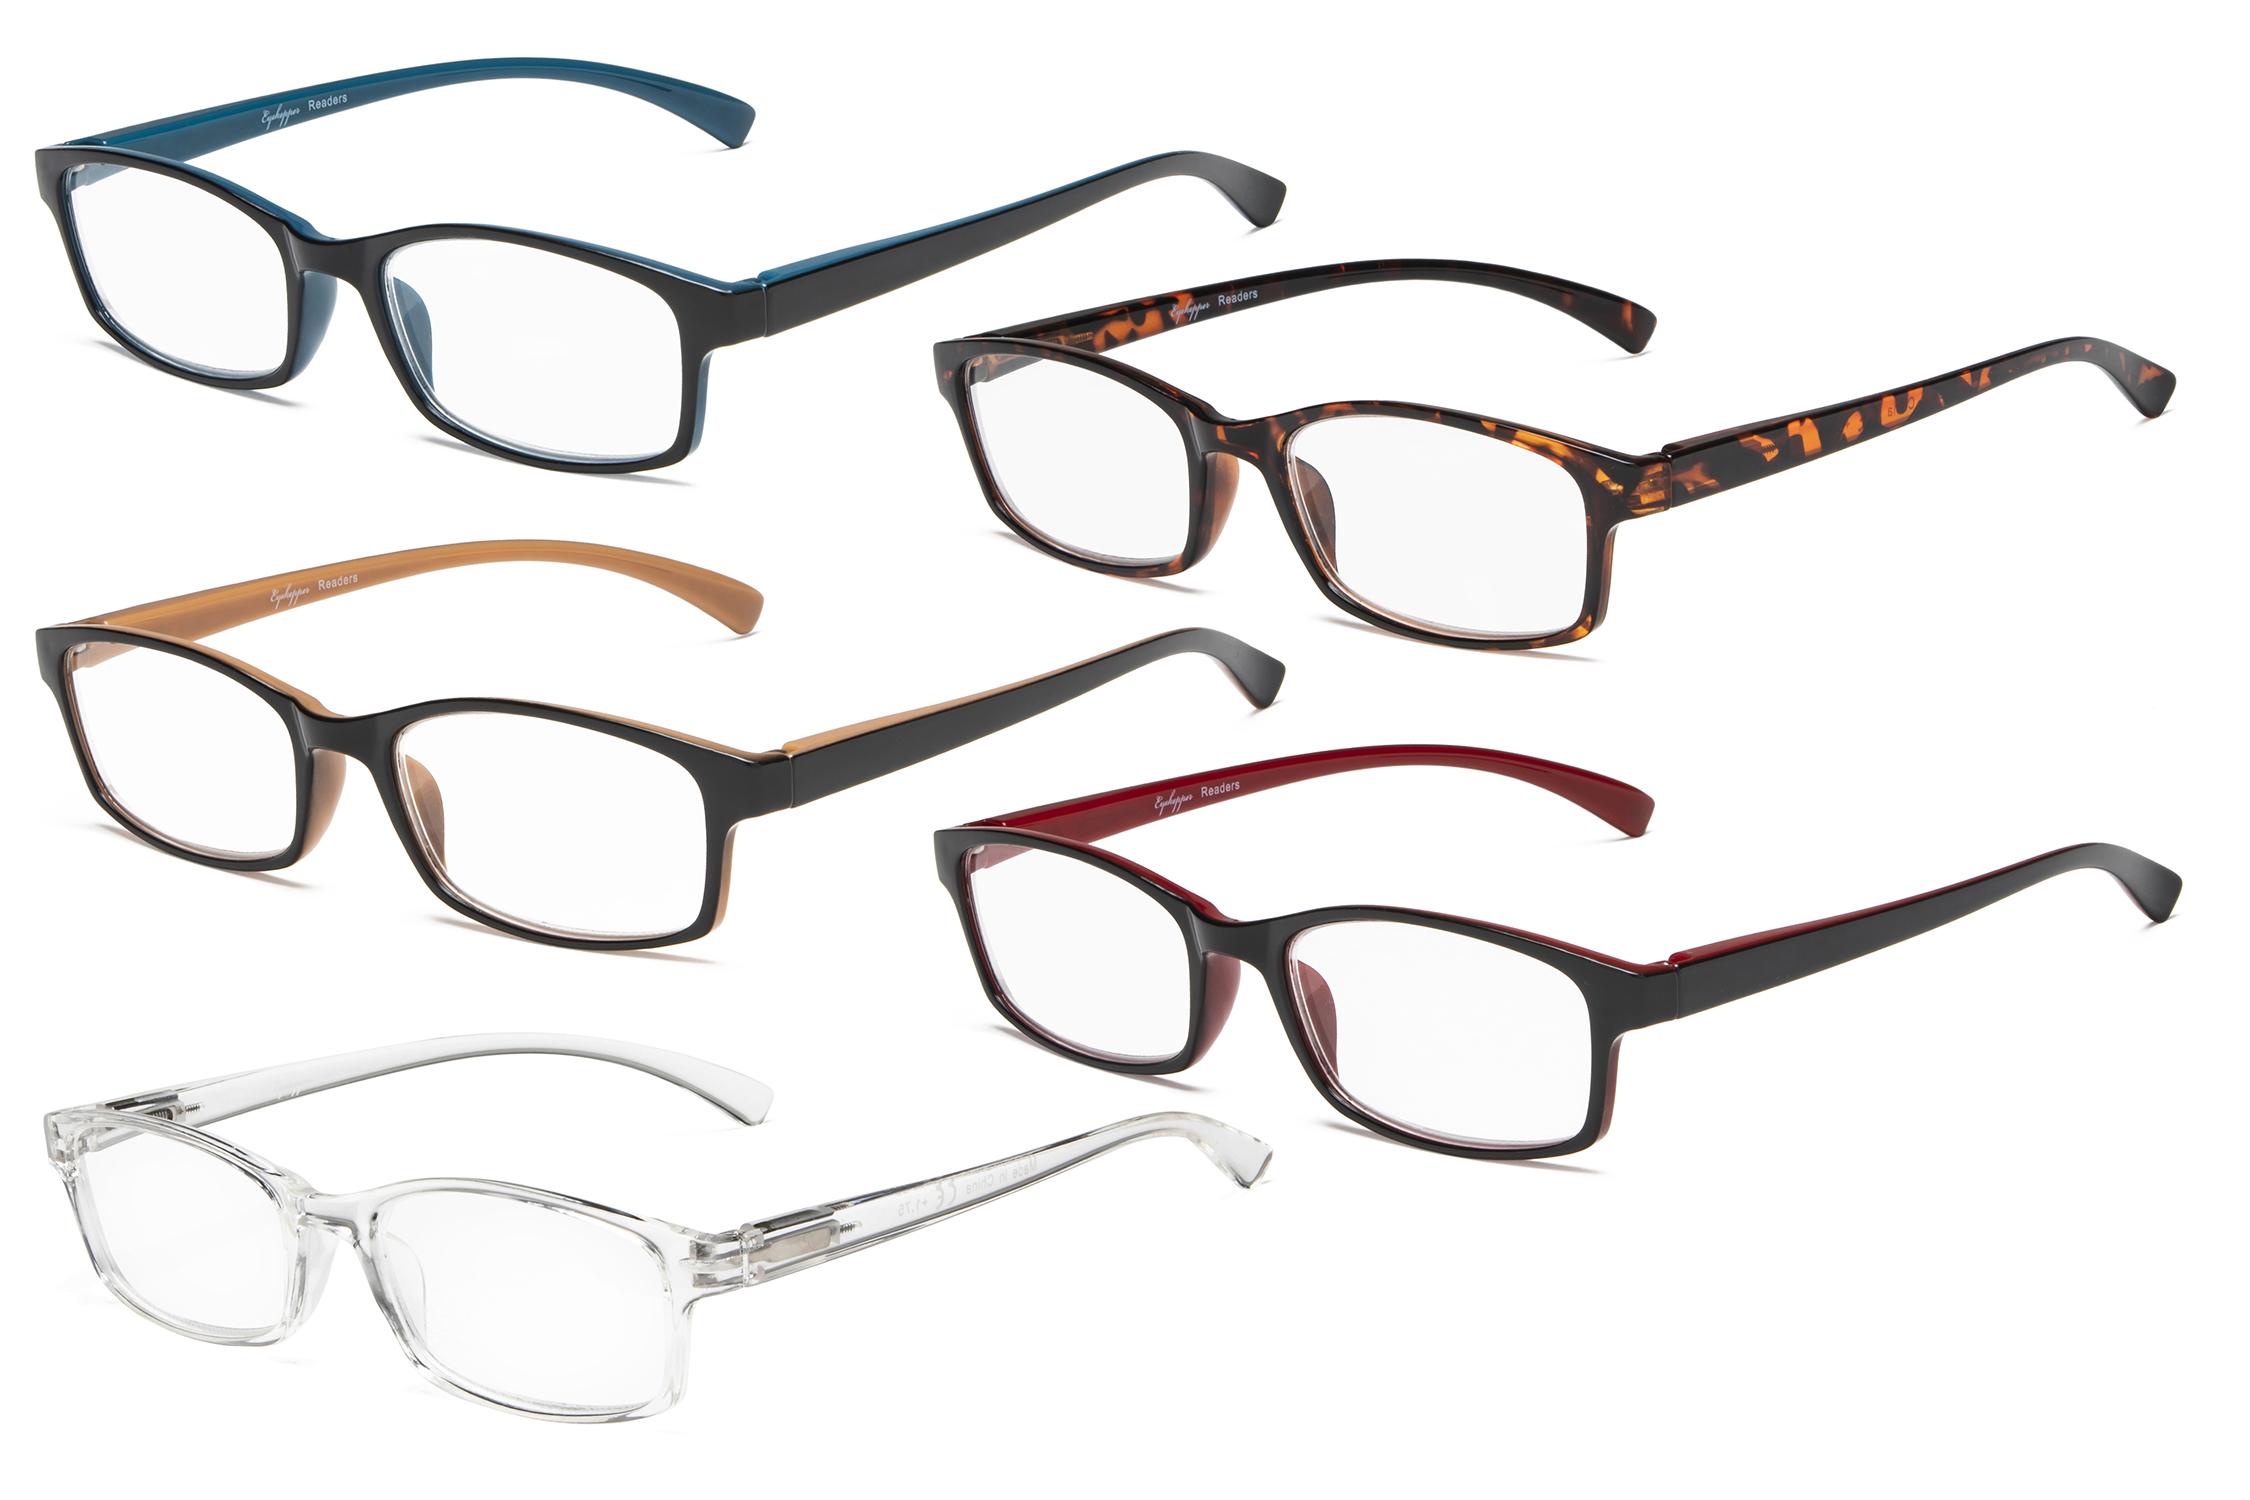 0cd7d44a2b48 Eyekepper Reading Glasses 5 Pairs Fort Readers Women Men R177 Mix